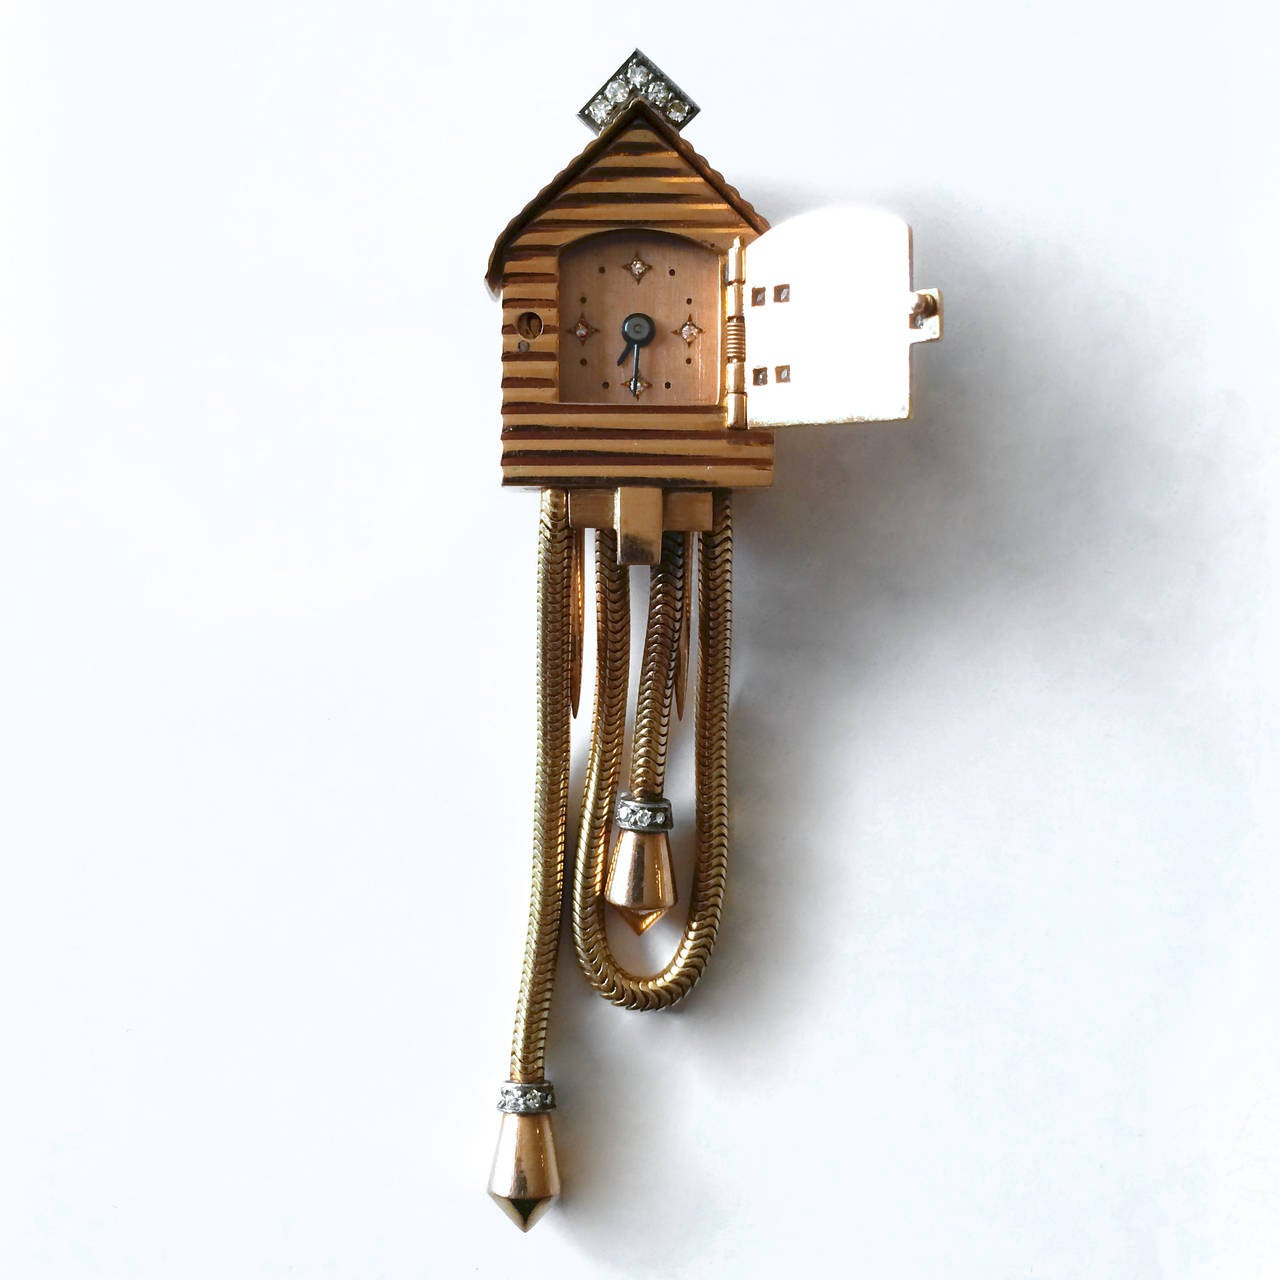 Uti cuckoo lapel pin watch 1940s at 1stdibs - Cuckoo watches ...